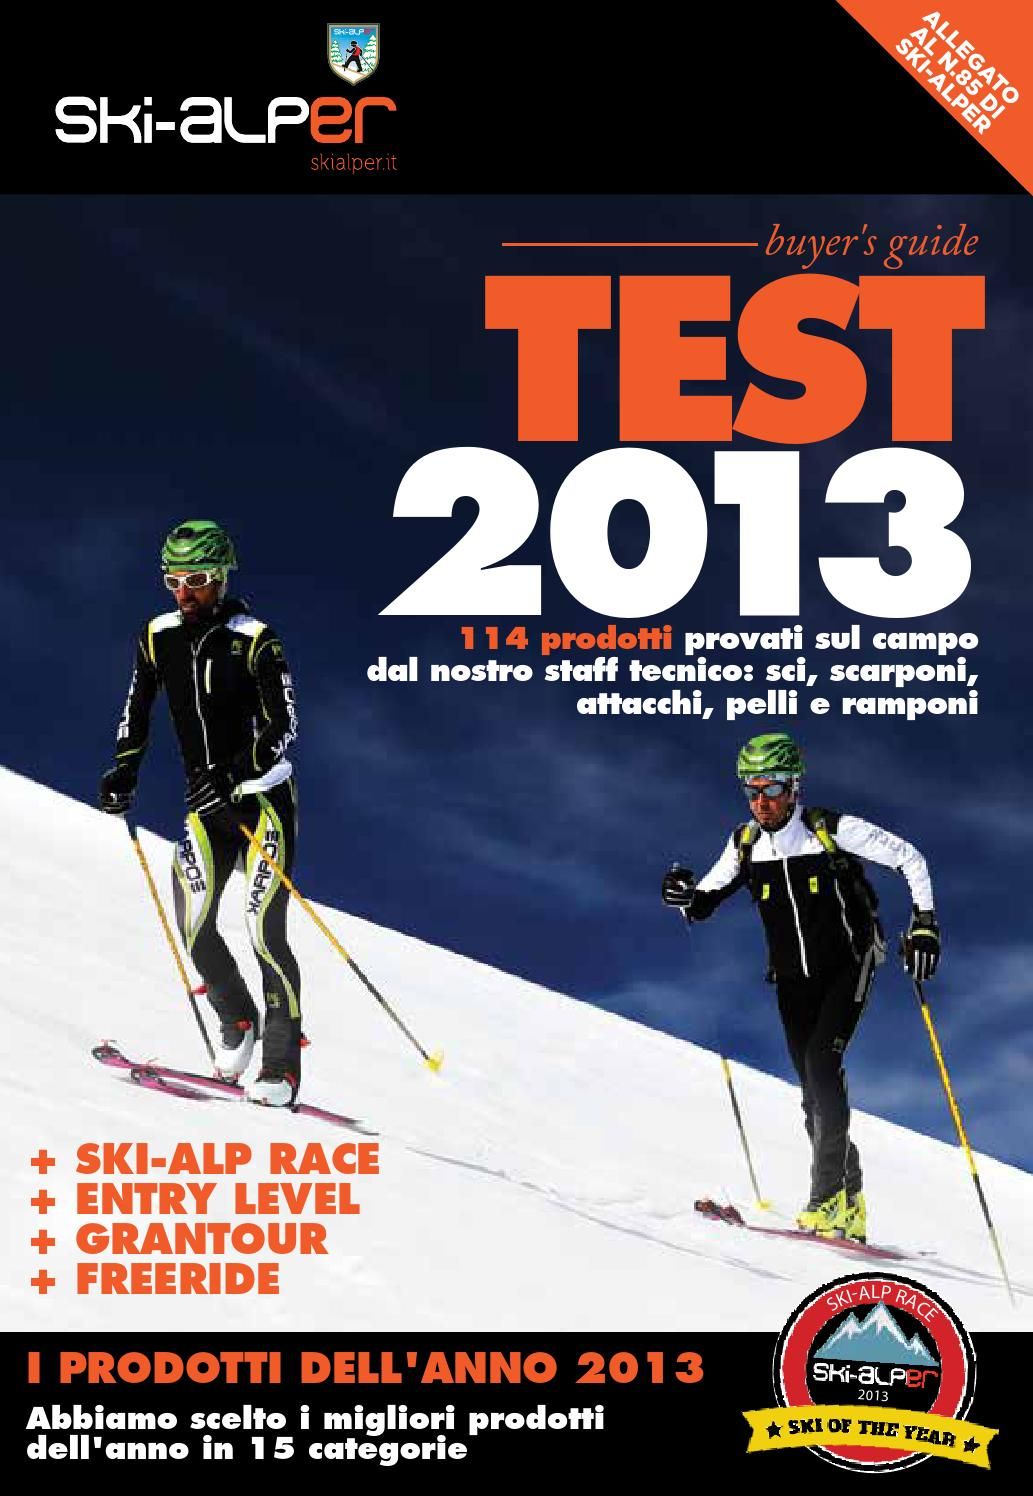 TEST 2013 - SKI-ALPER by Mulatero Editore - issuu 5b2e5ef11dd6